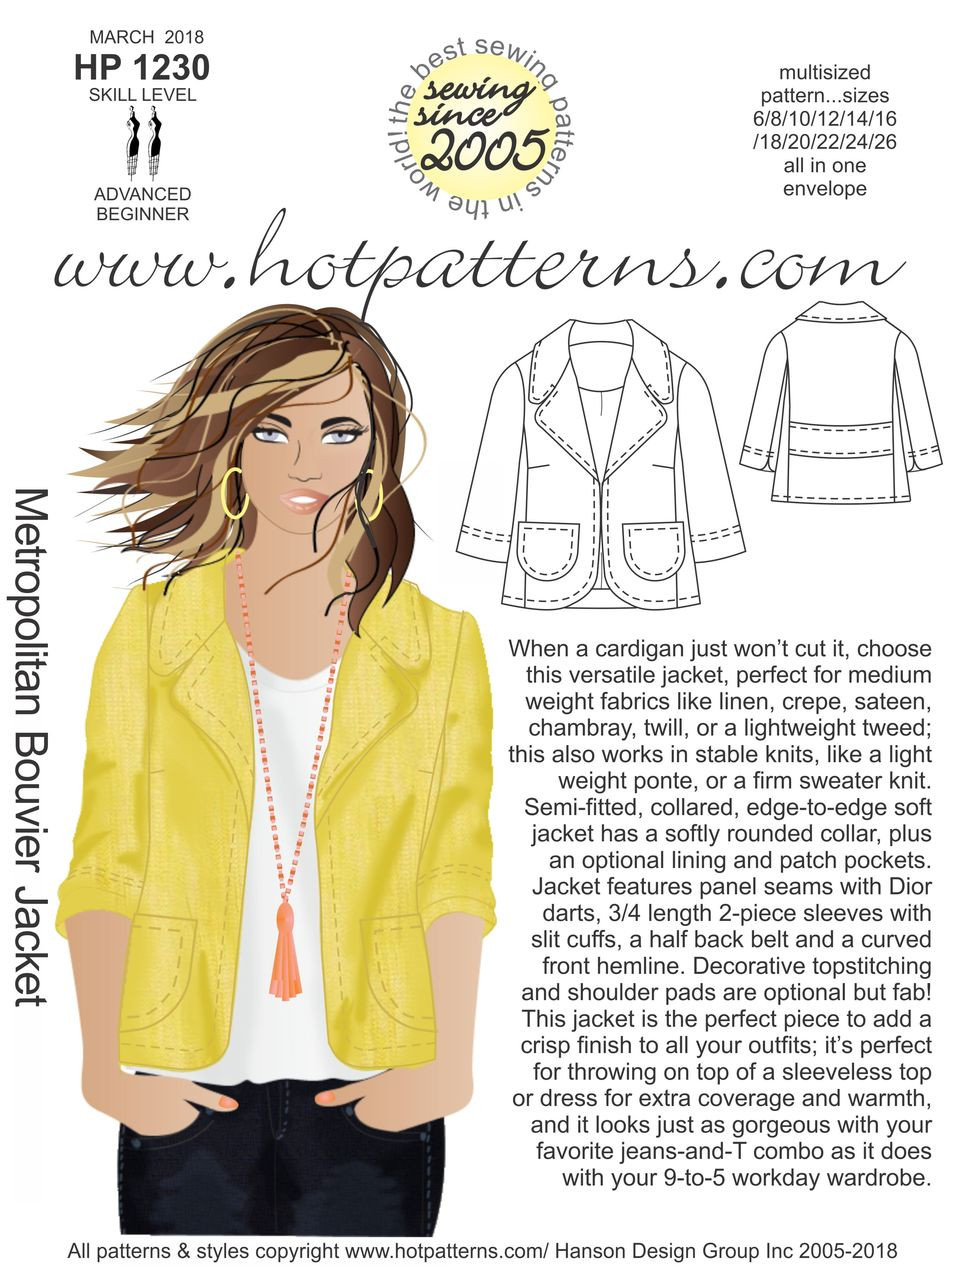 HP 1230 Metropolitan Bouvier Jacket